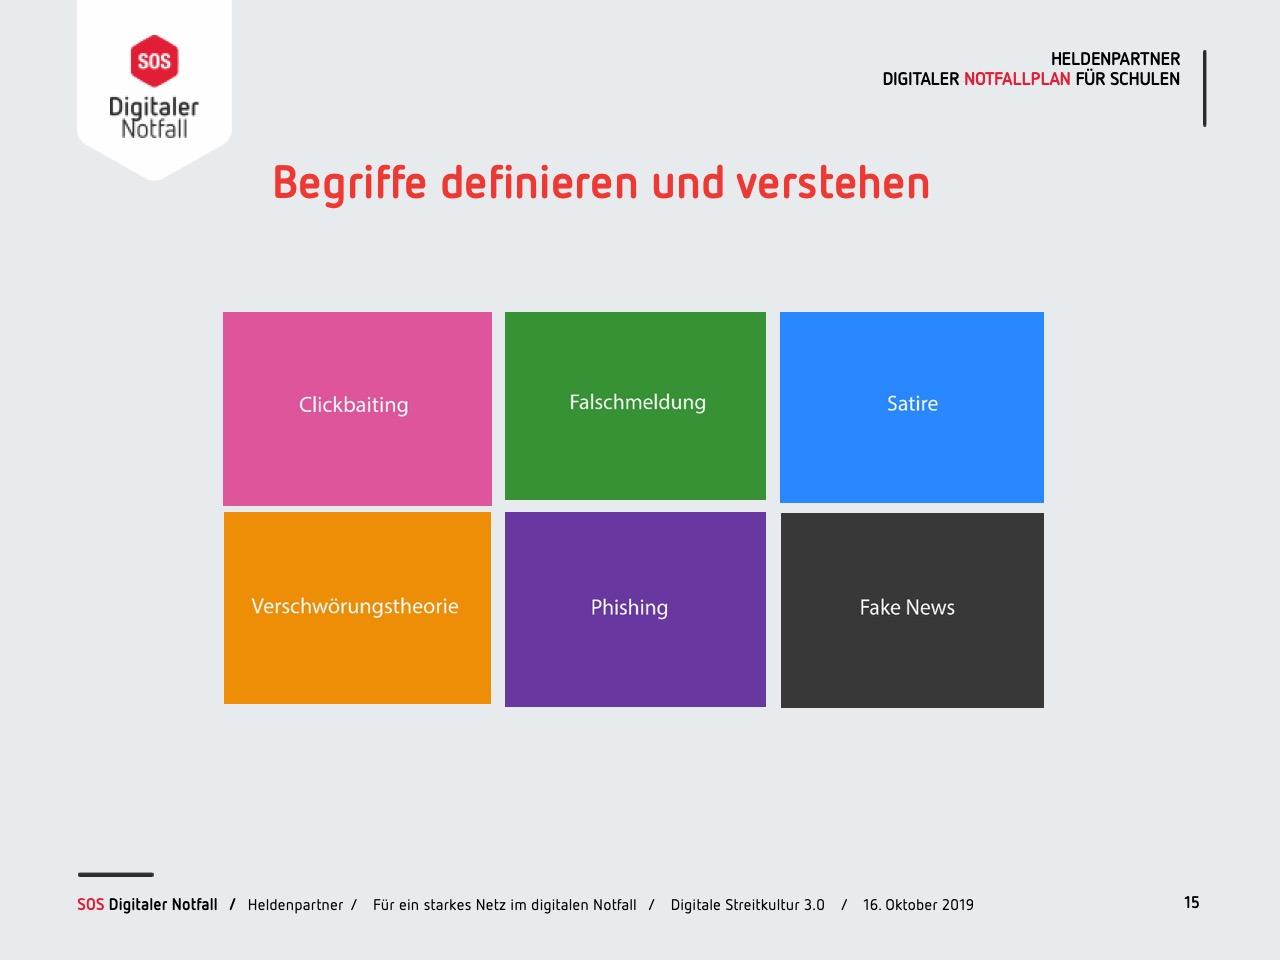 2019_10_01_Webinar_Digitaler_Notfall_Streitkultur 3.0_final_AP